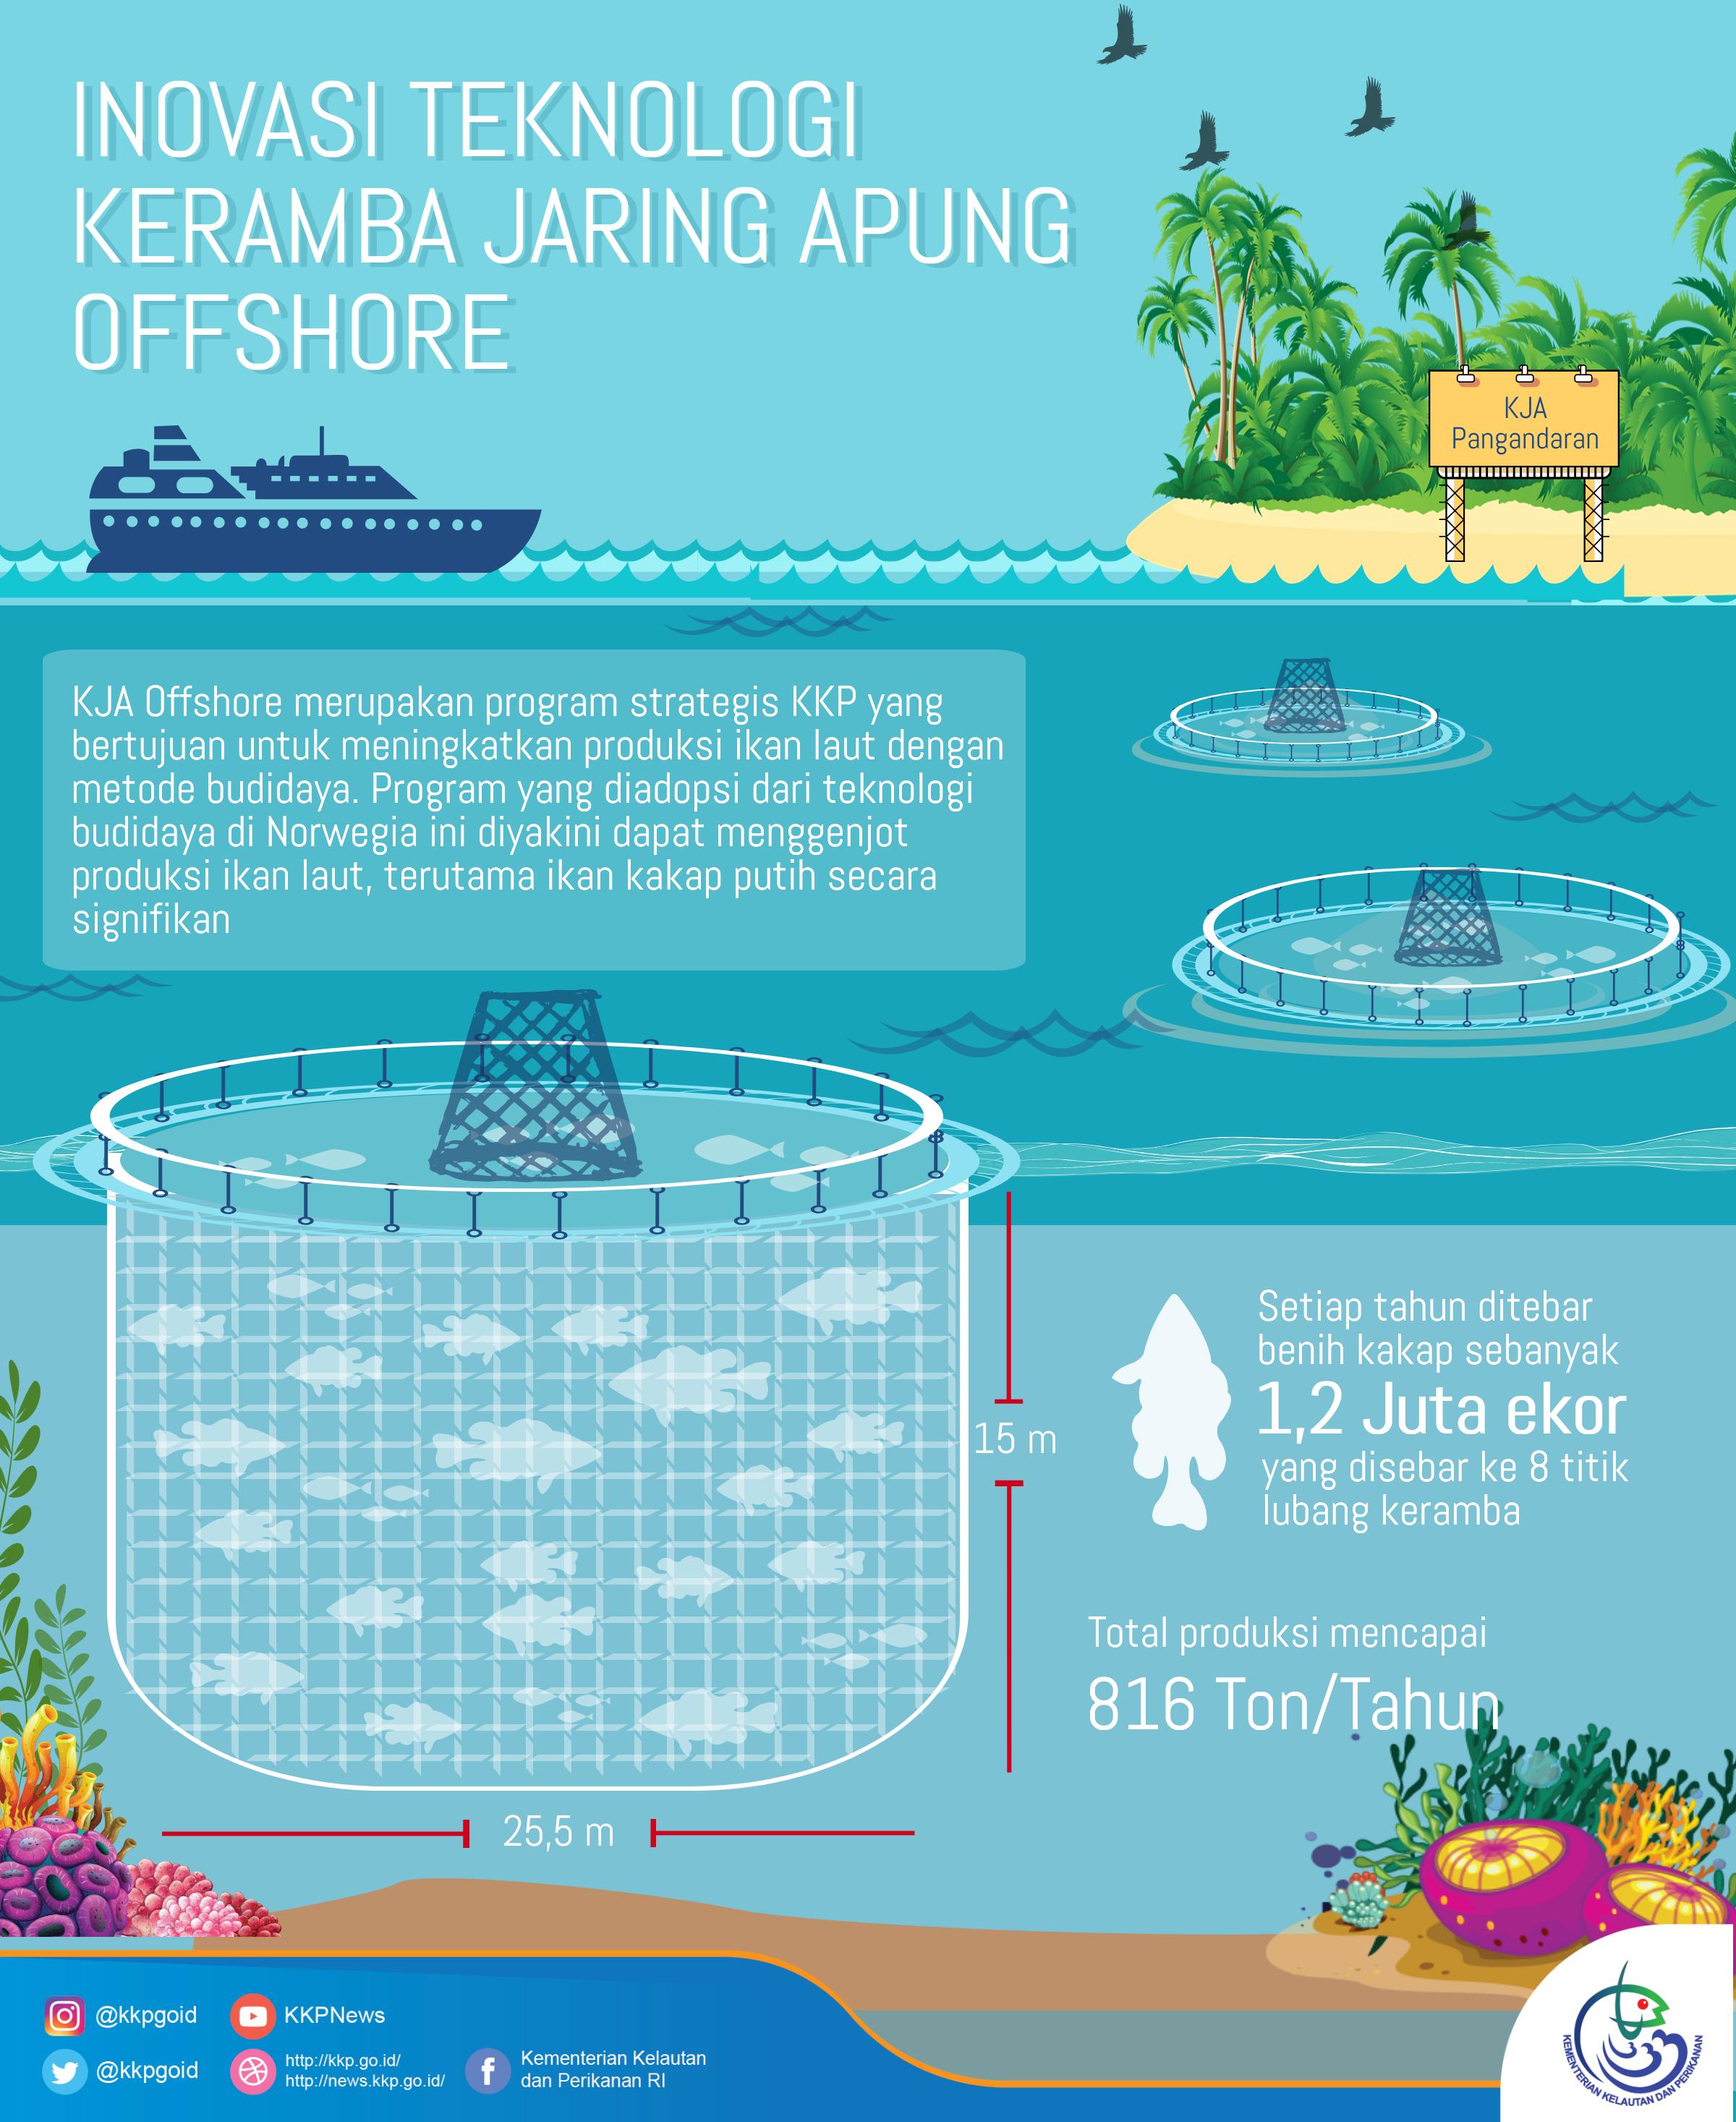 KJA Offshore: Membangun Industri Marikultur Modern